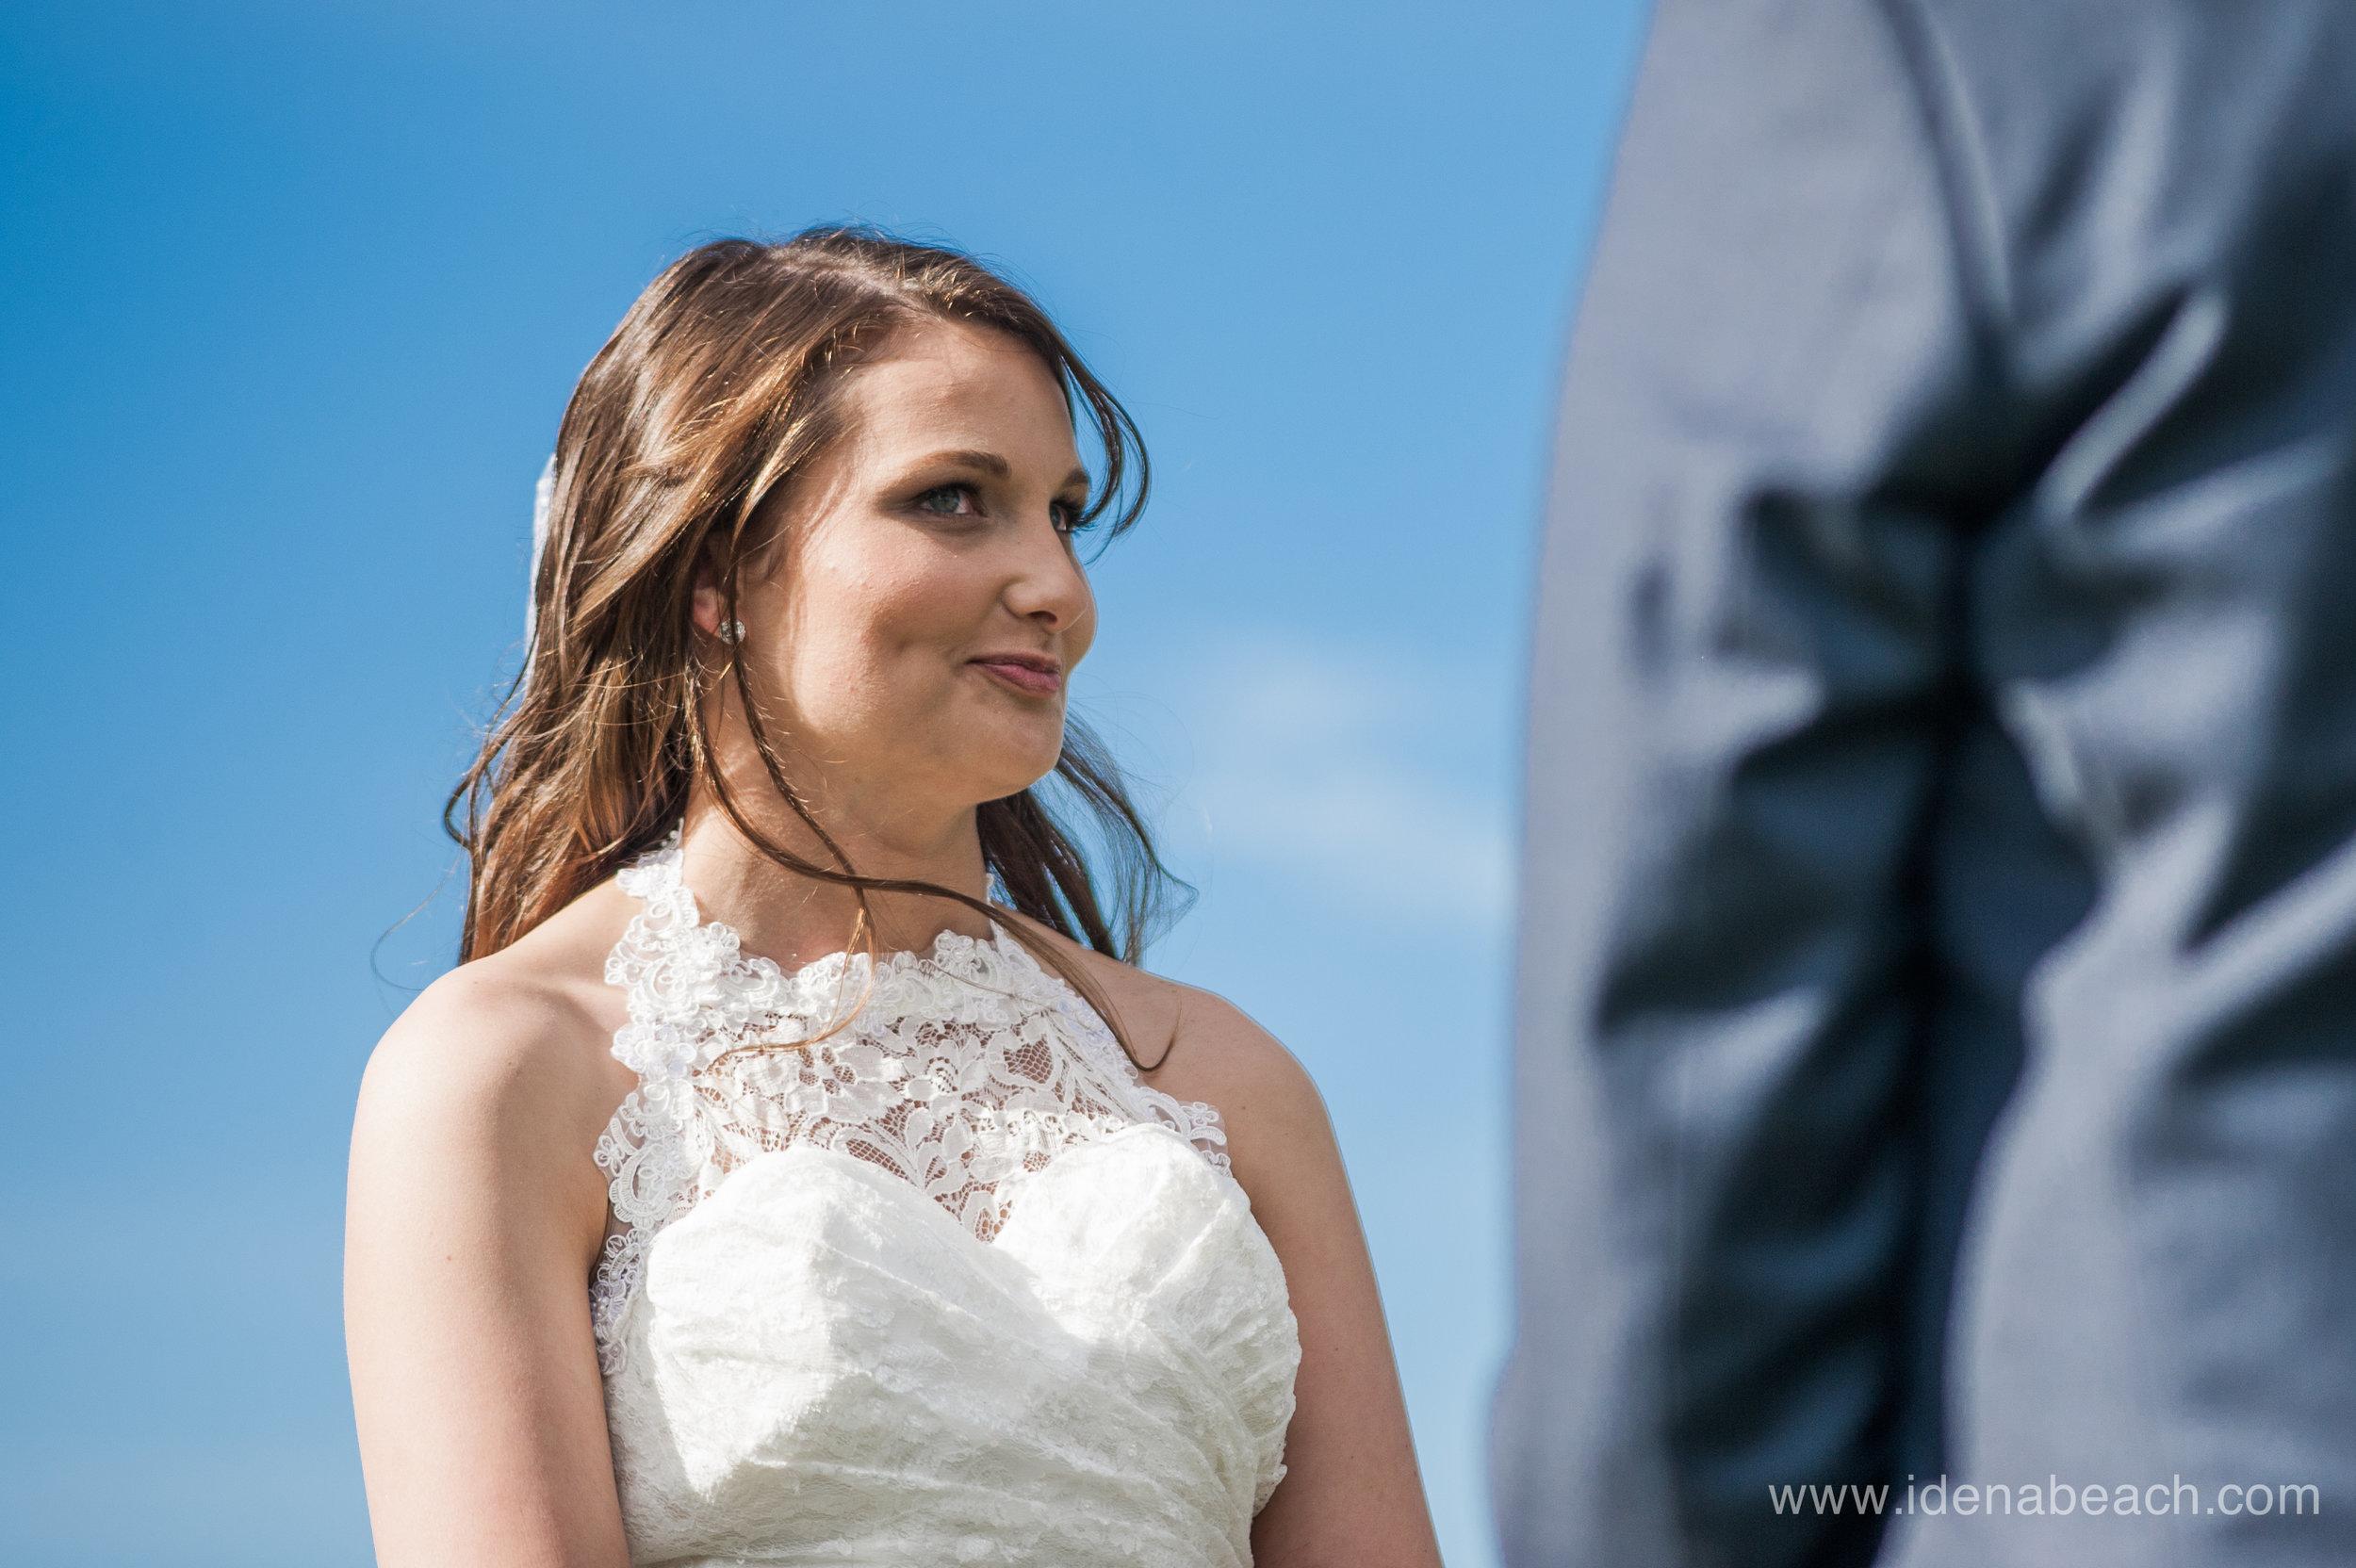 Mountain-Top-Inn-Vermont-Wedding-Photographer-55.jpg